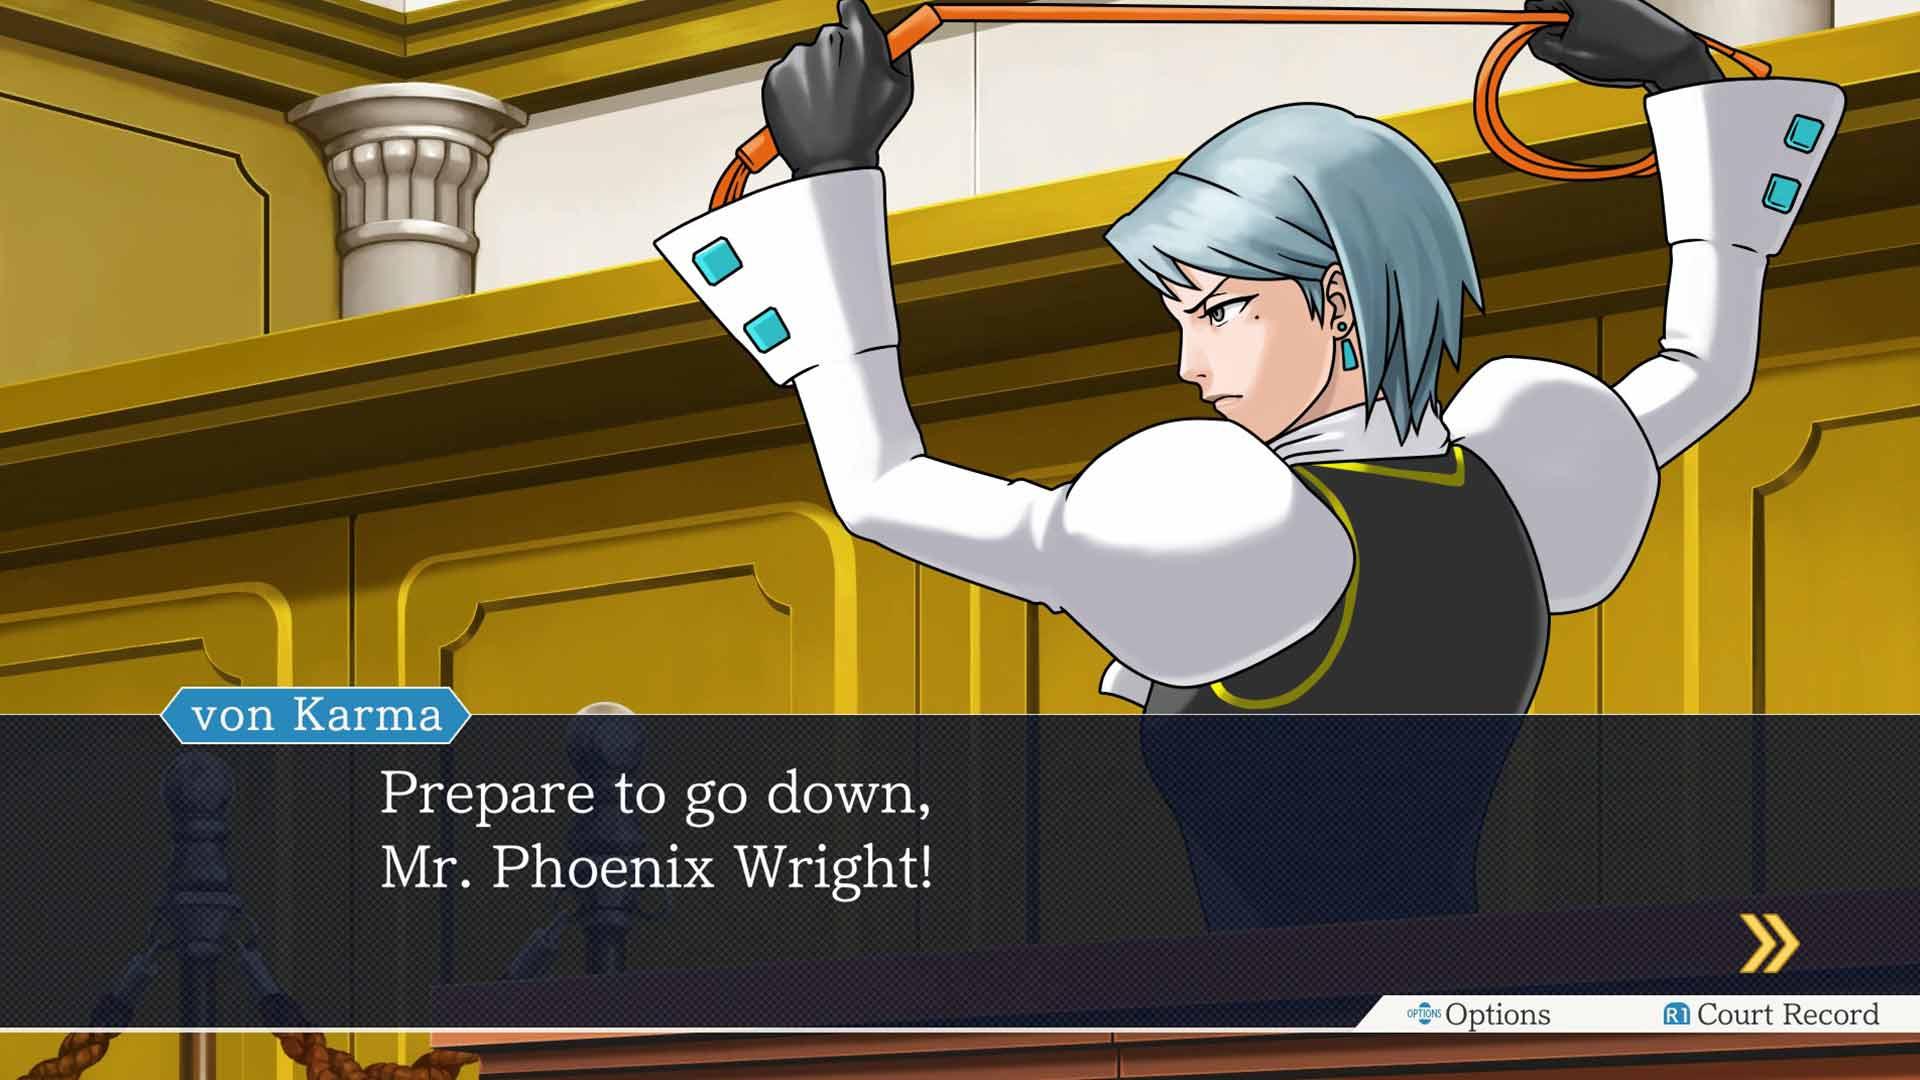 Phoenix Wright: Ace Attorney Trilogy / 逆転裁判123 成歩堂セレクション game image